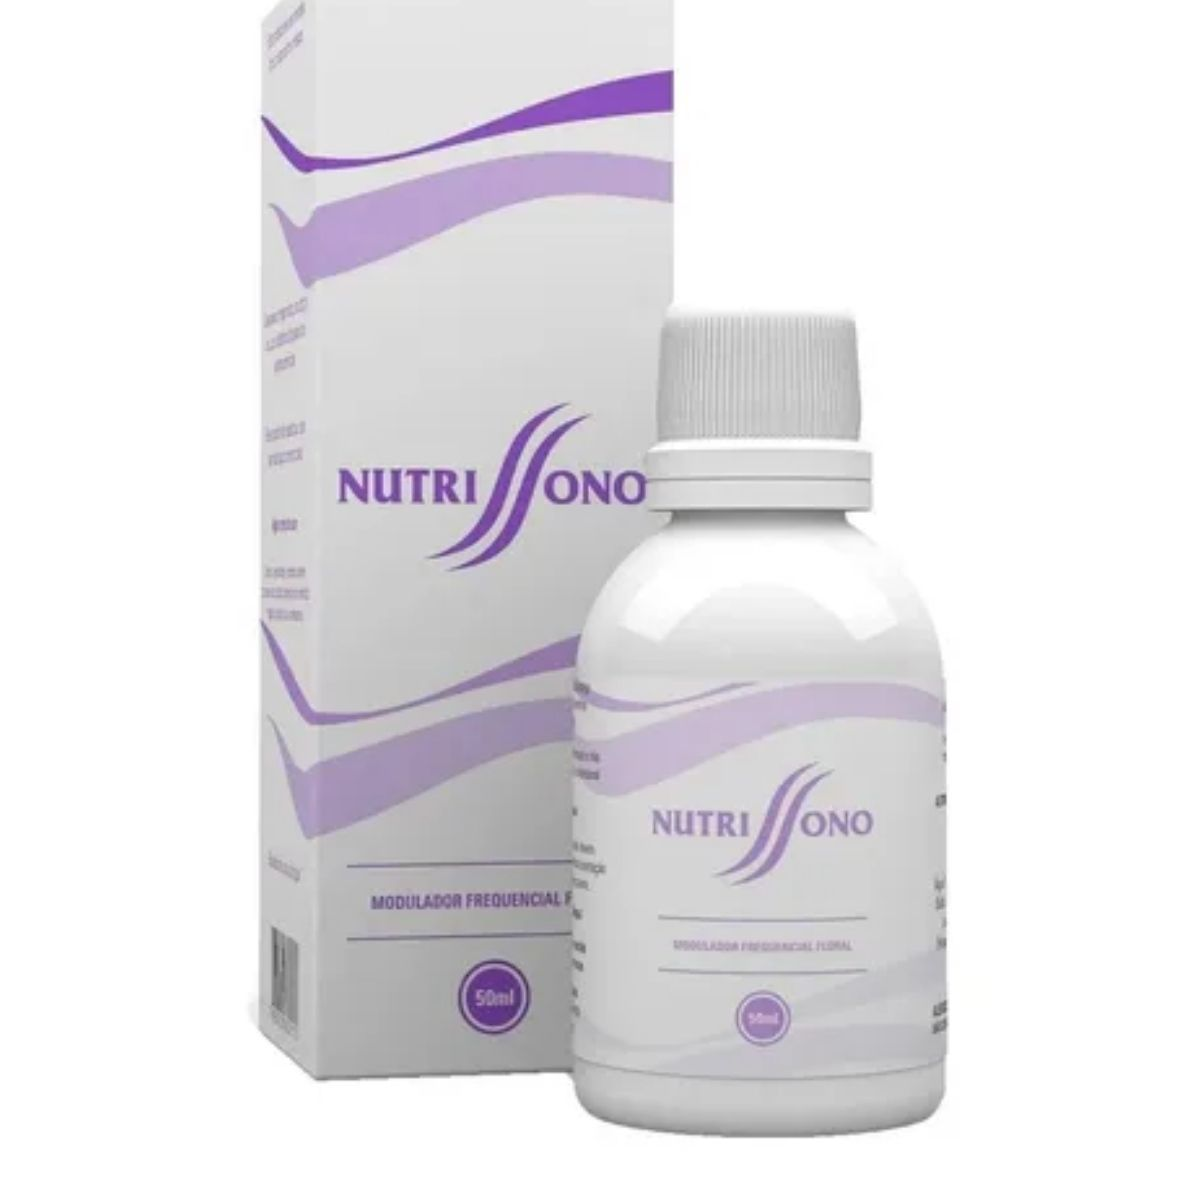 NUTRISSONO 50 ML